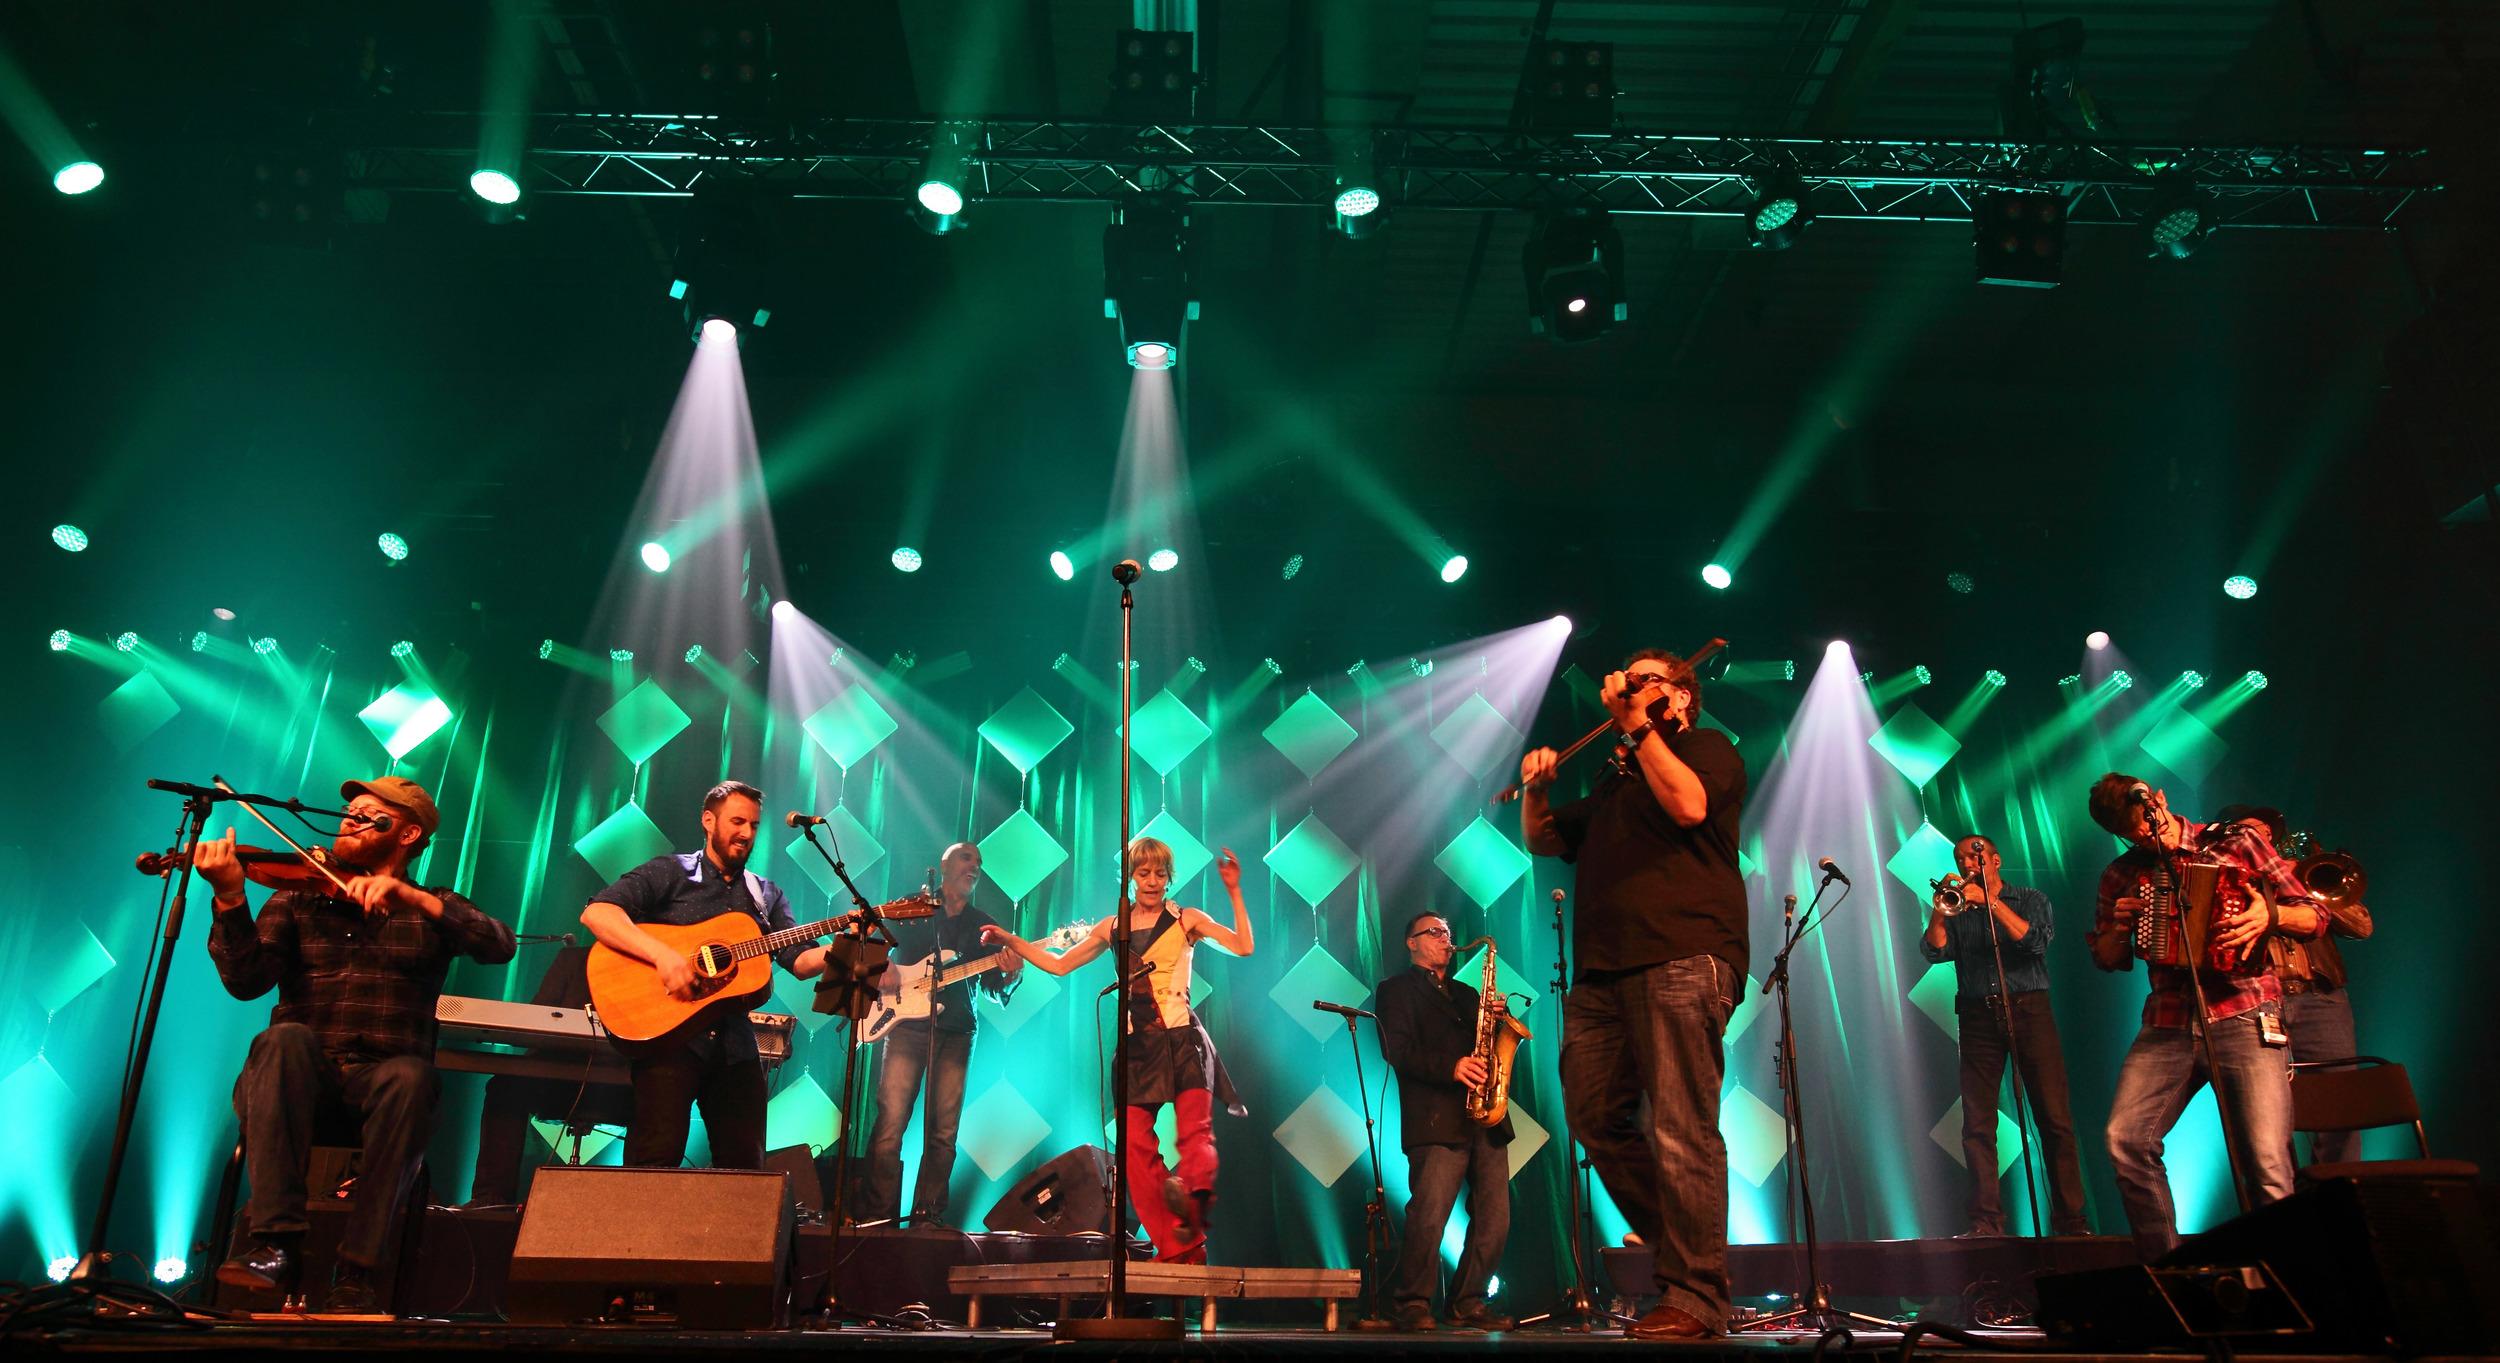 Festivalgalla Arvid Anthun_MG_2978.jpg